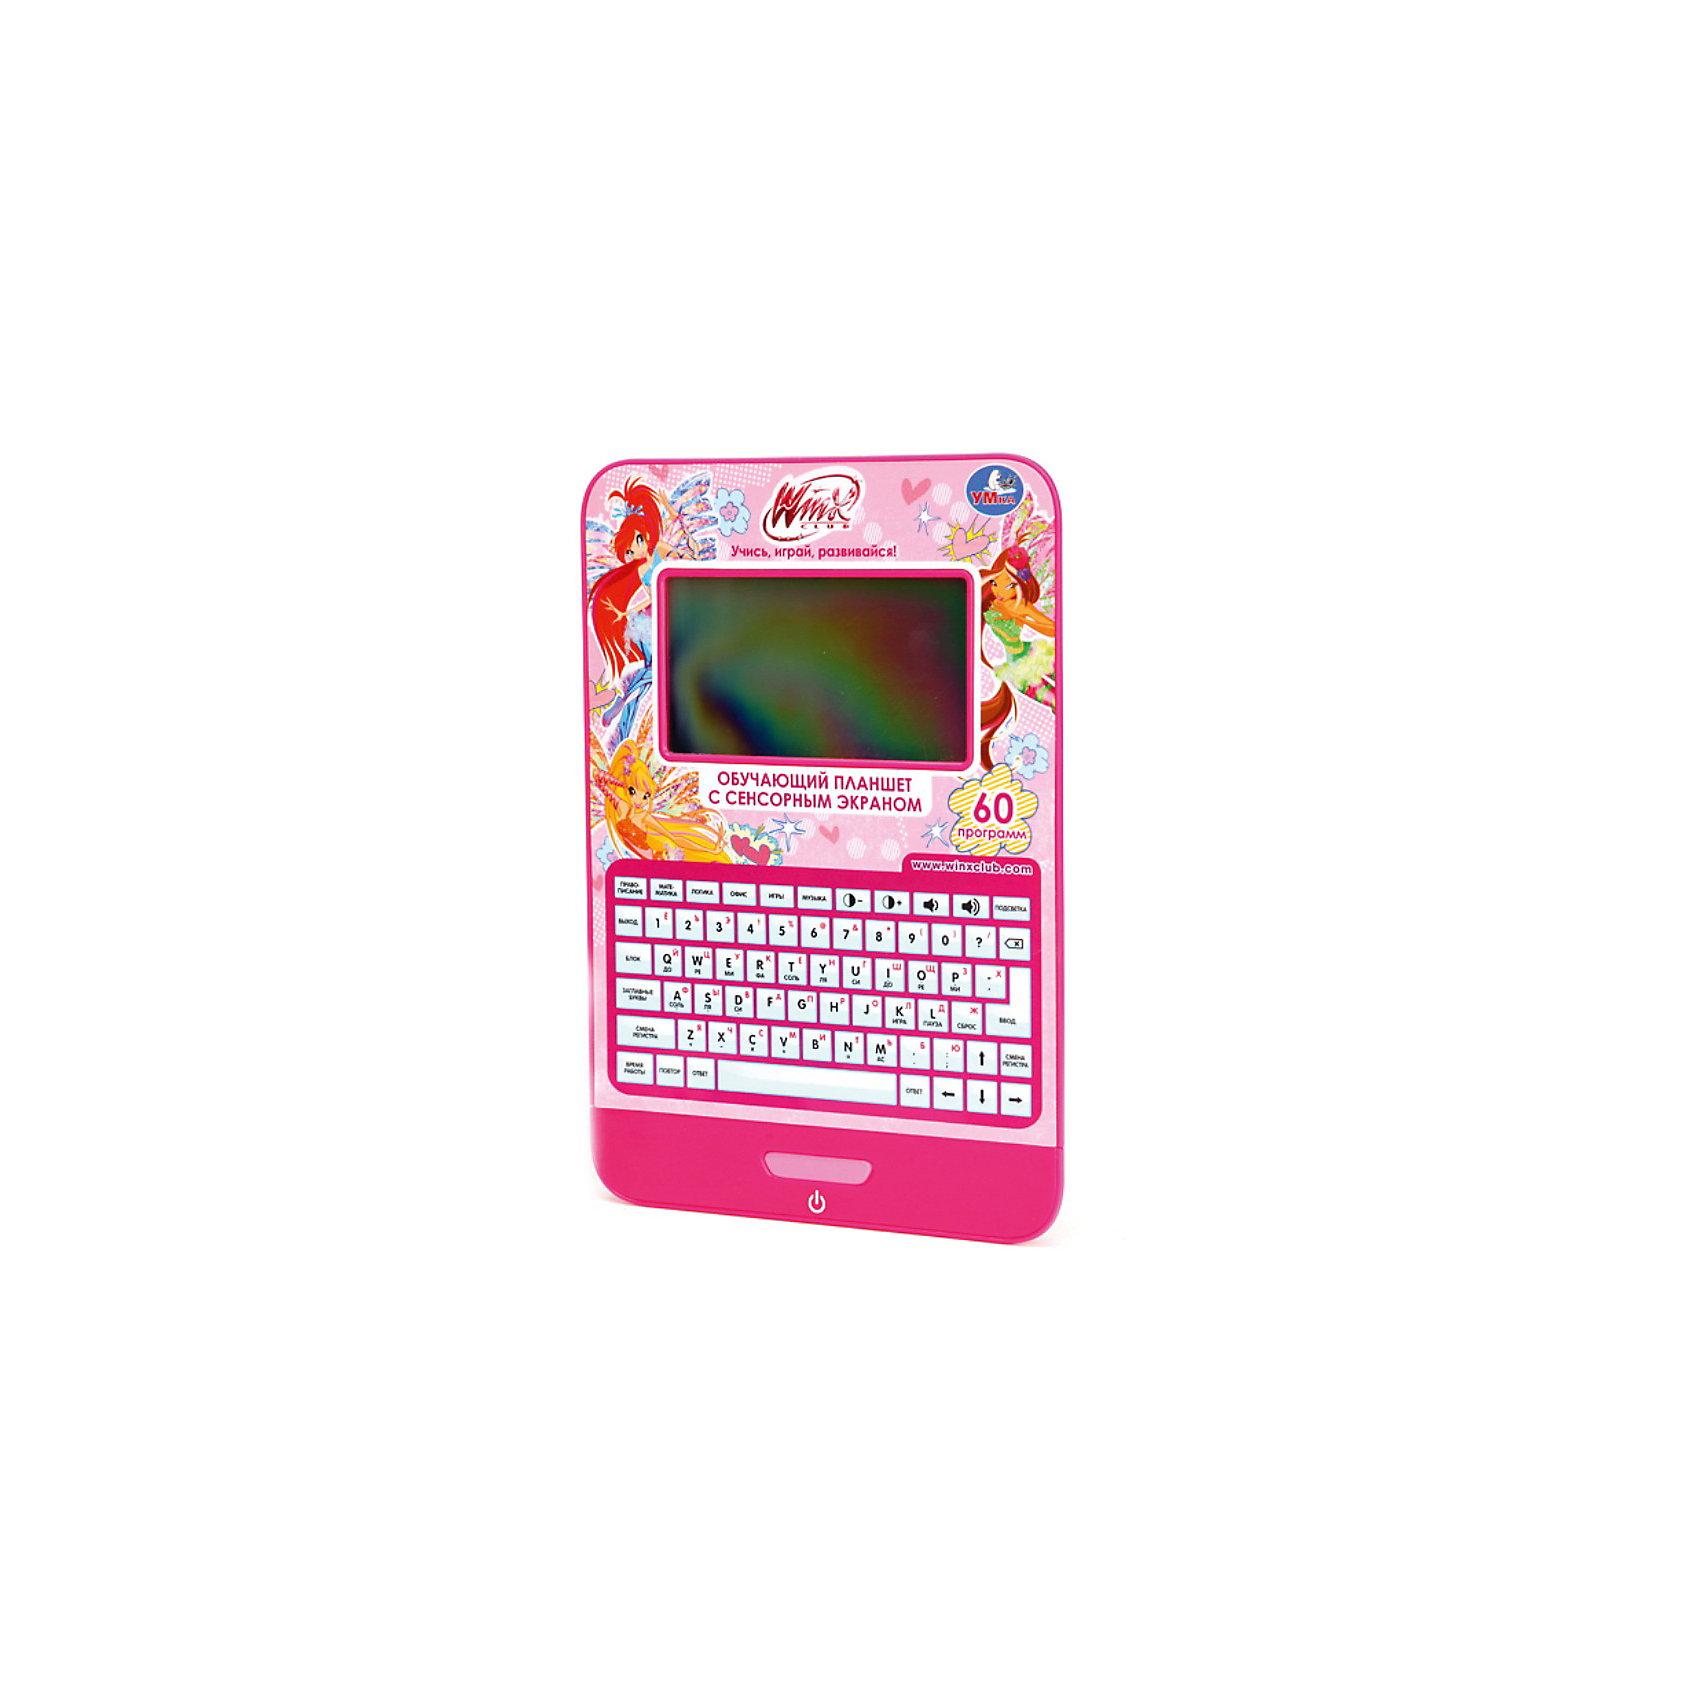 Умка Обучающий планшет Winx Club, 60 программ, Умка умка обучающий компьютер winx club 176 программ